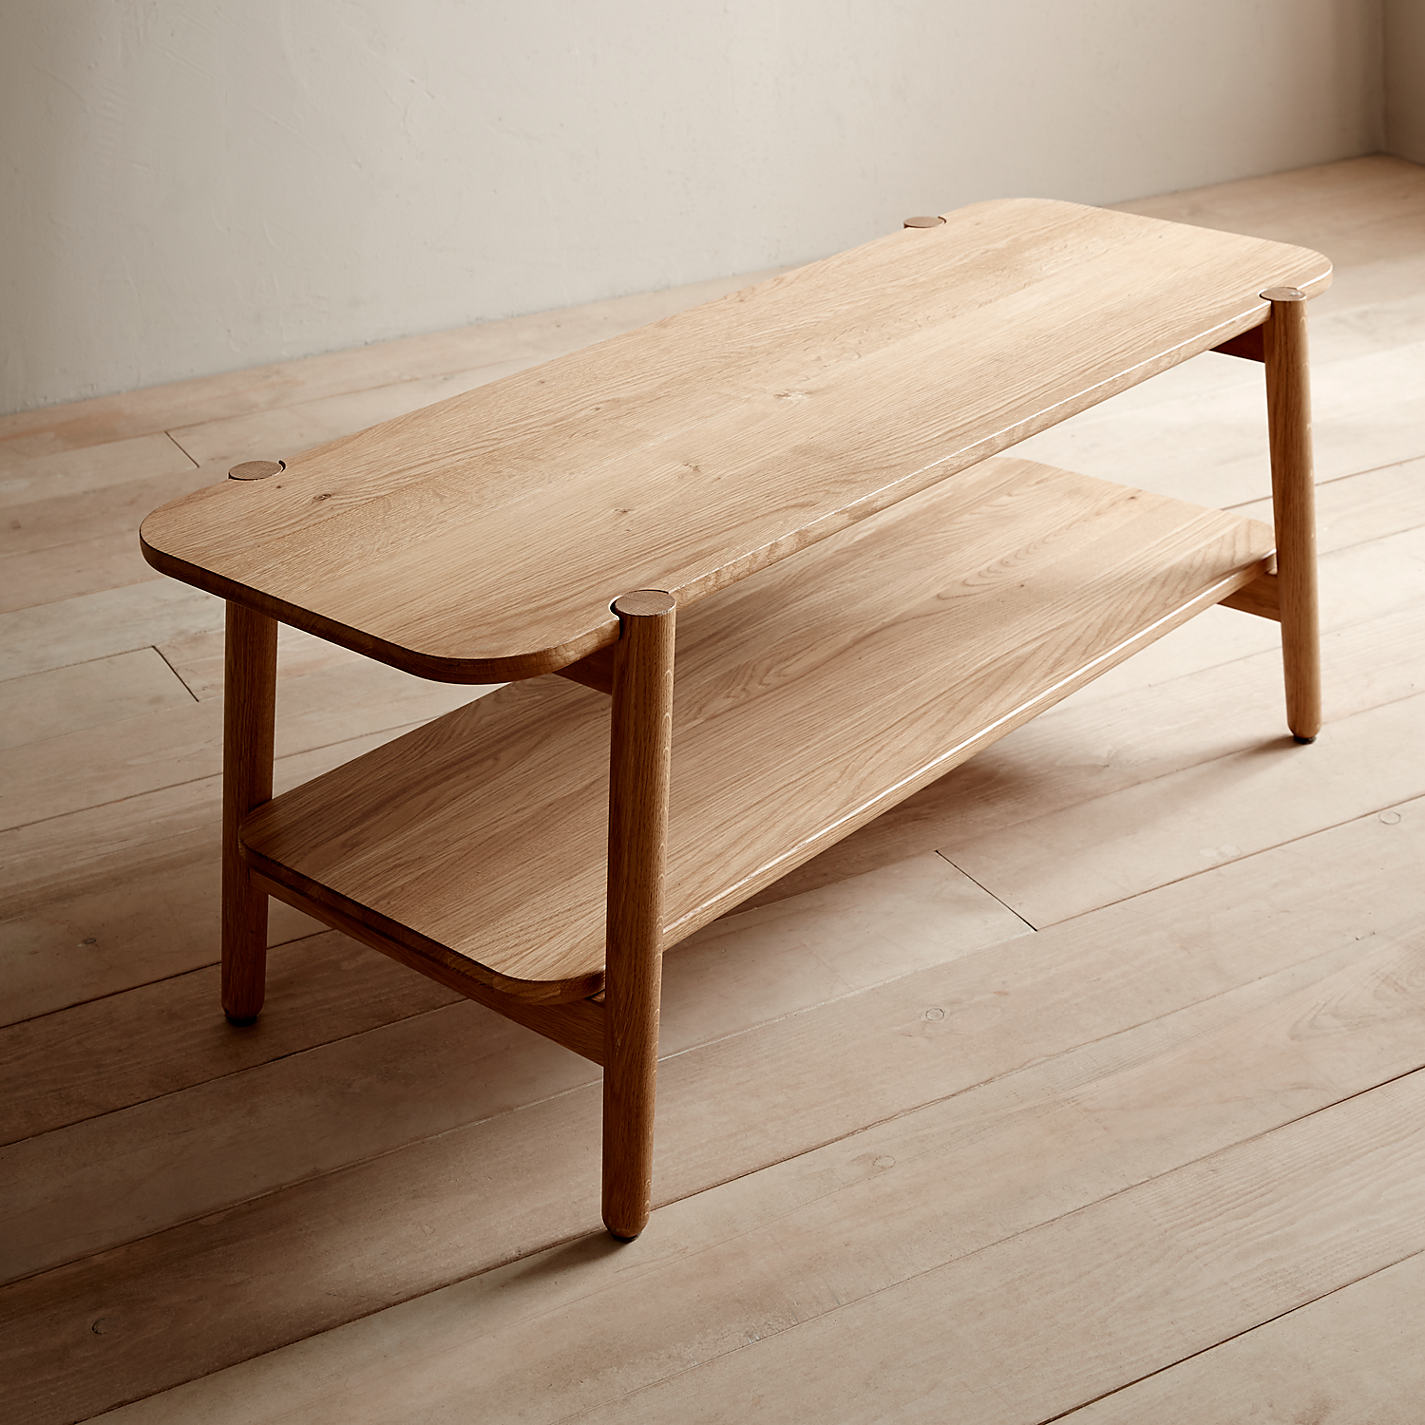 Buy Design Project By John Lewis No 022 Coffee Table Oak John Lewis # Meuble Tv John